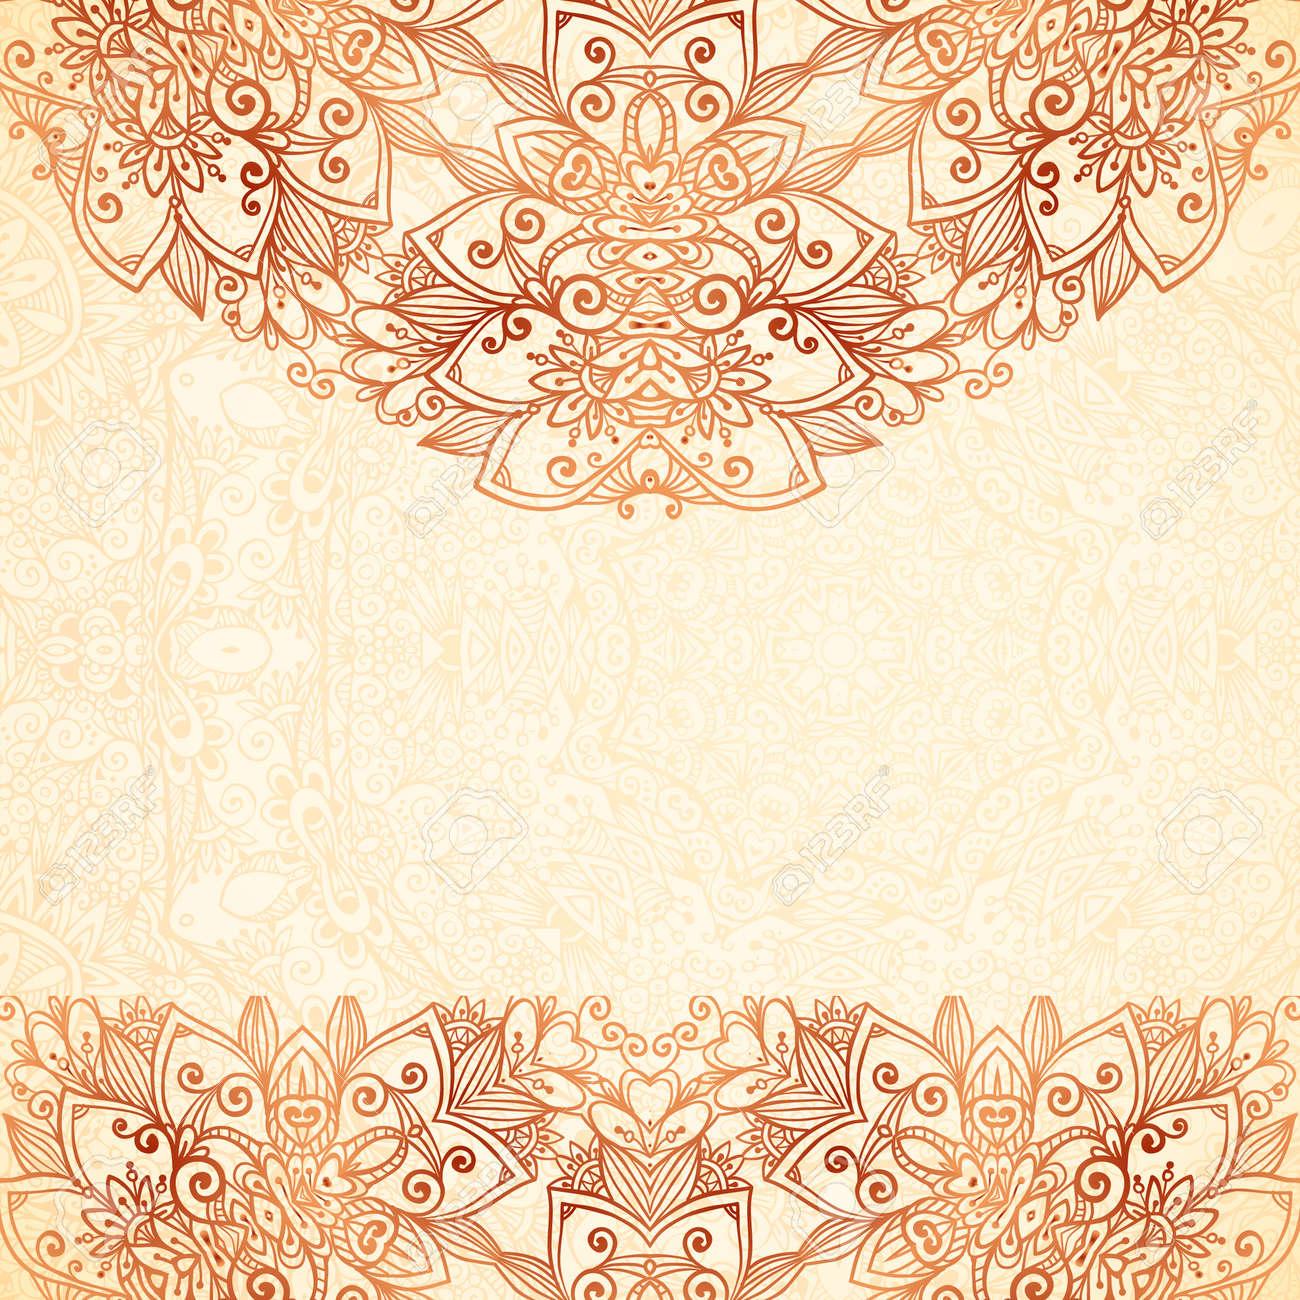 Ornate vintage vector background in mehndi style royalty free stock - Ornate Vintage Background In Mehndi Style Stock Vector 30312409